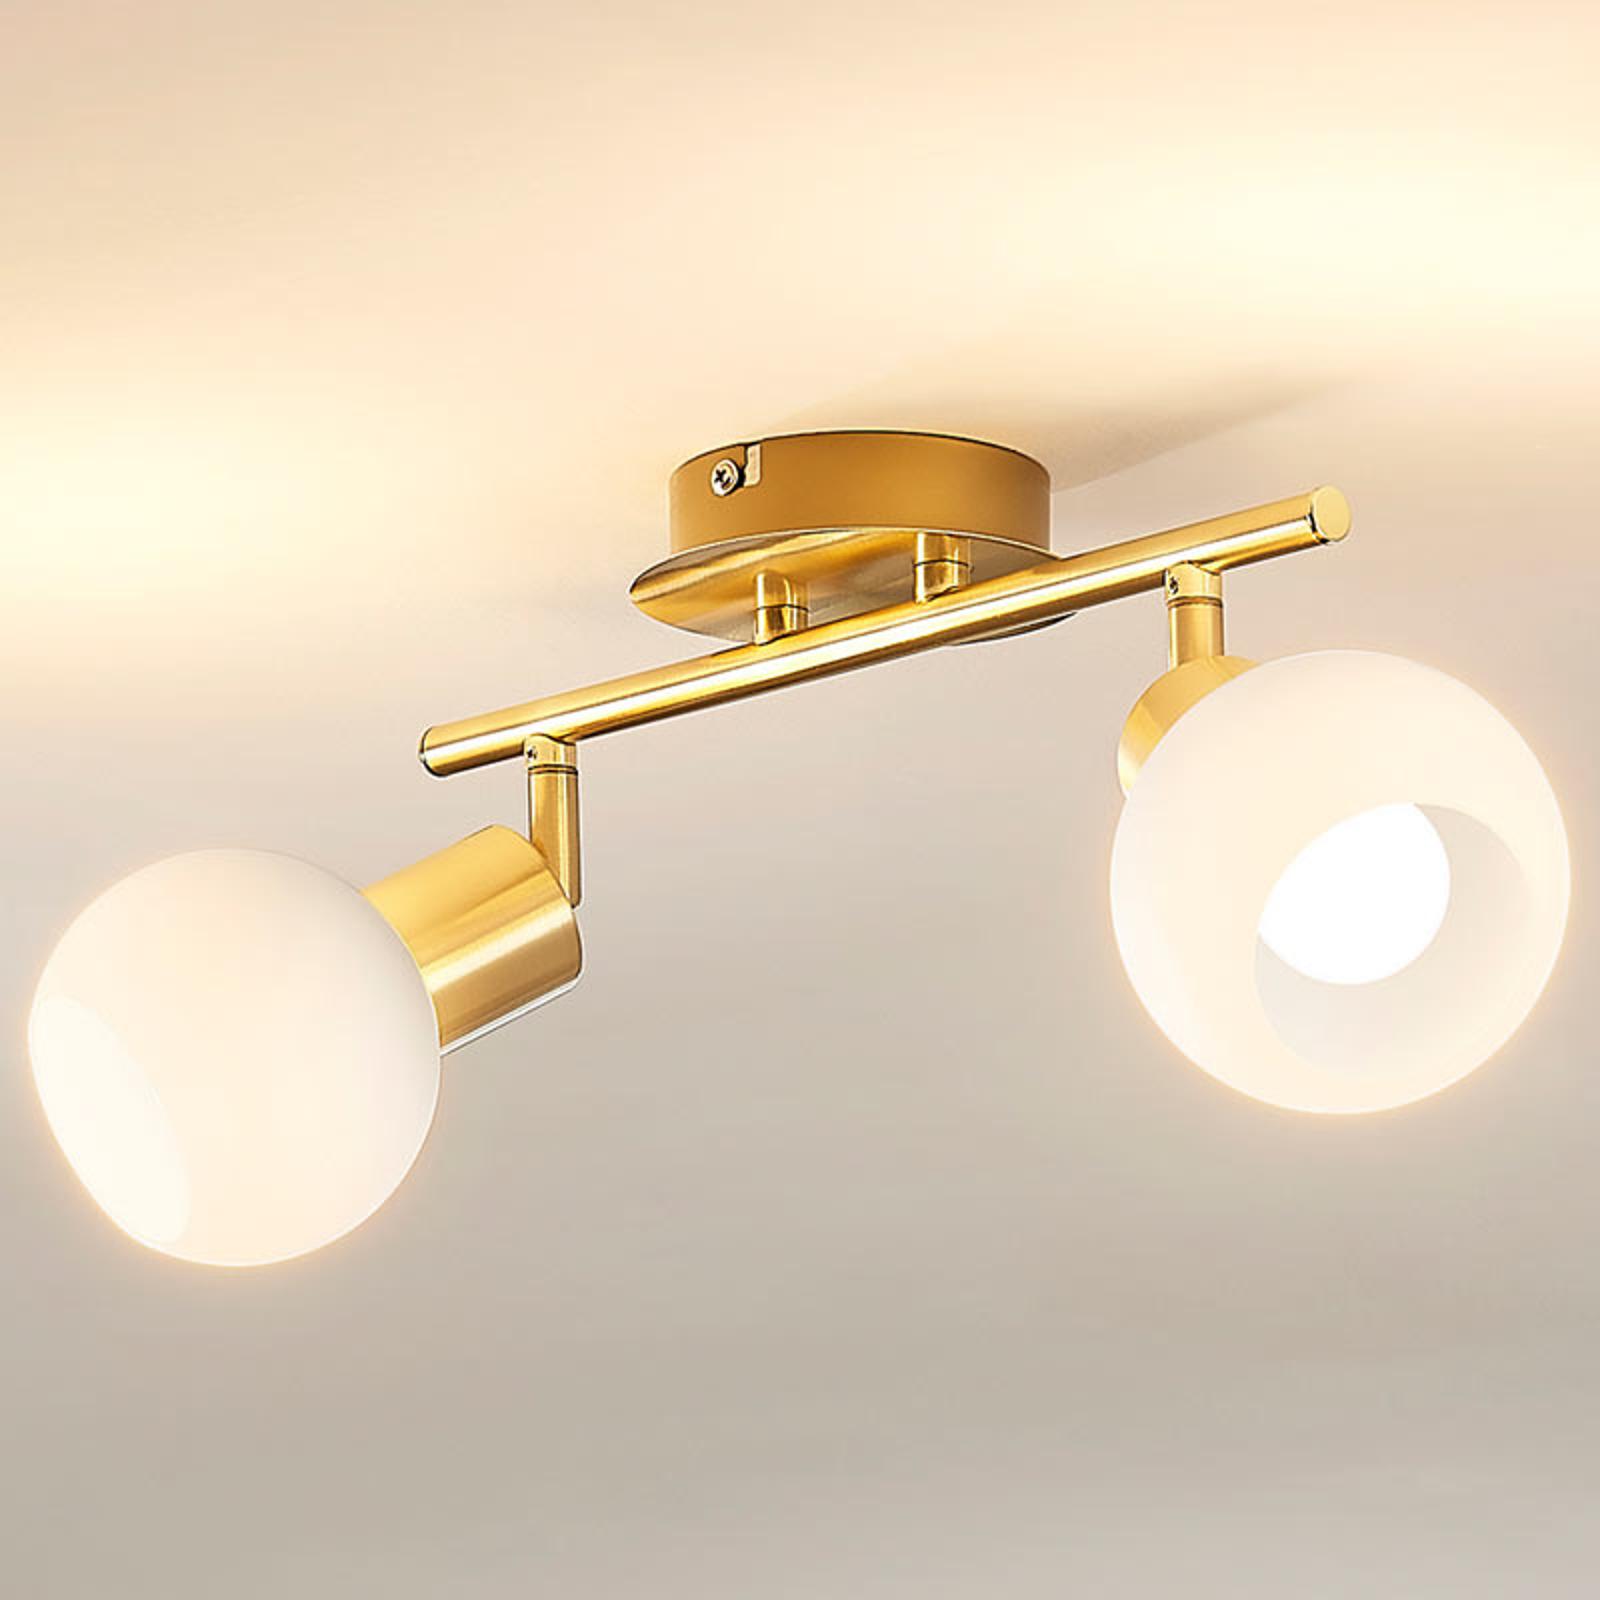 Plafondlamp Elaina met E14 LED-lampen, messing